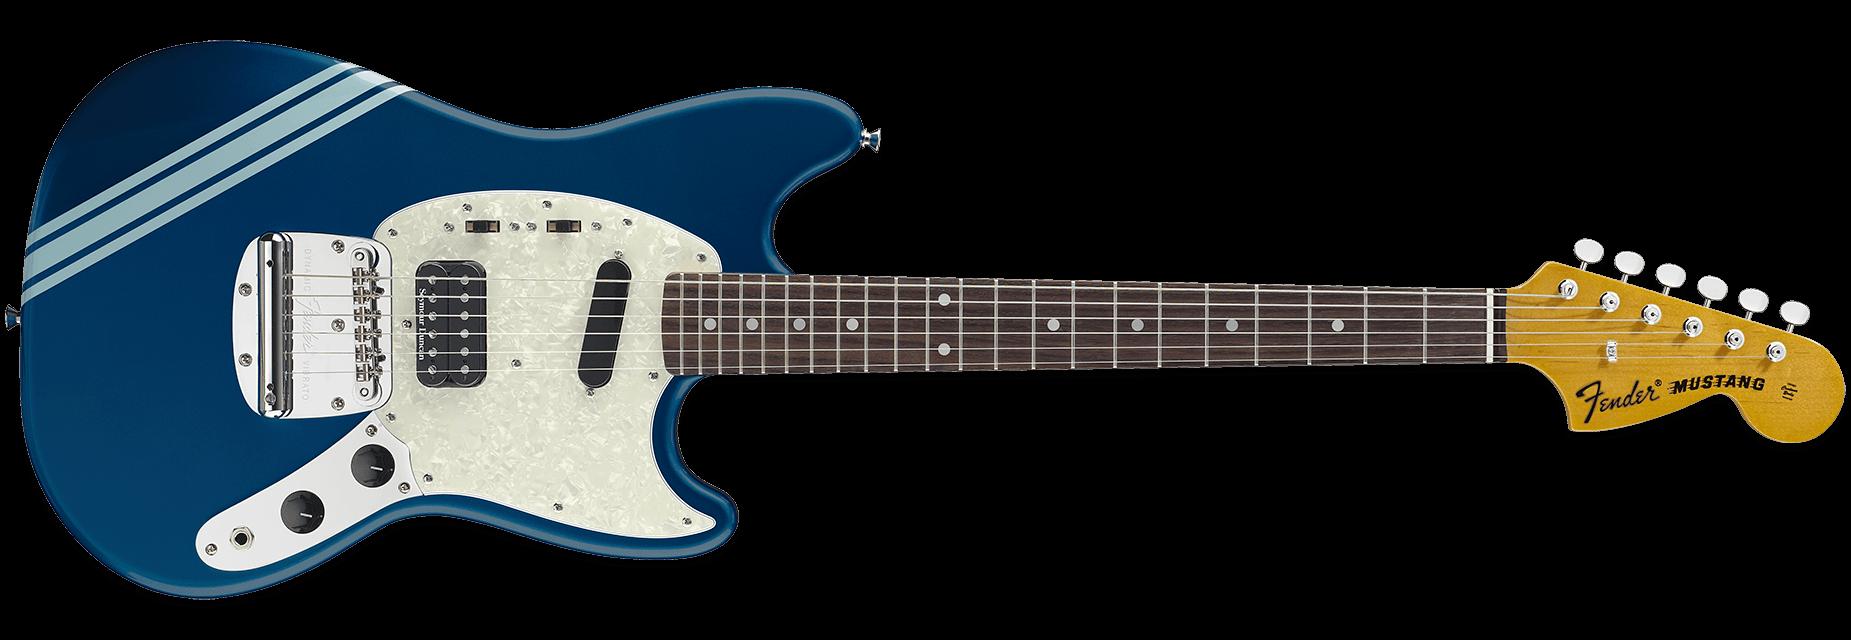 Fender Kurt Cobain Mustang Dark Lake Placid Blue